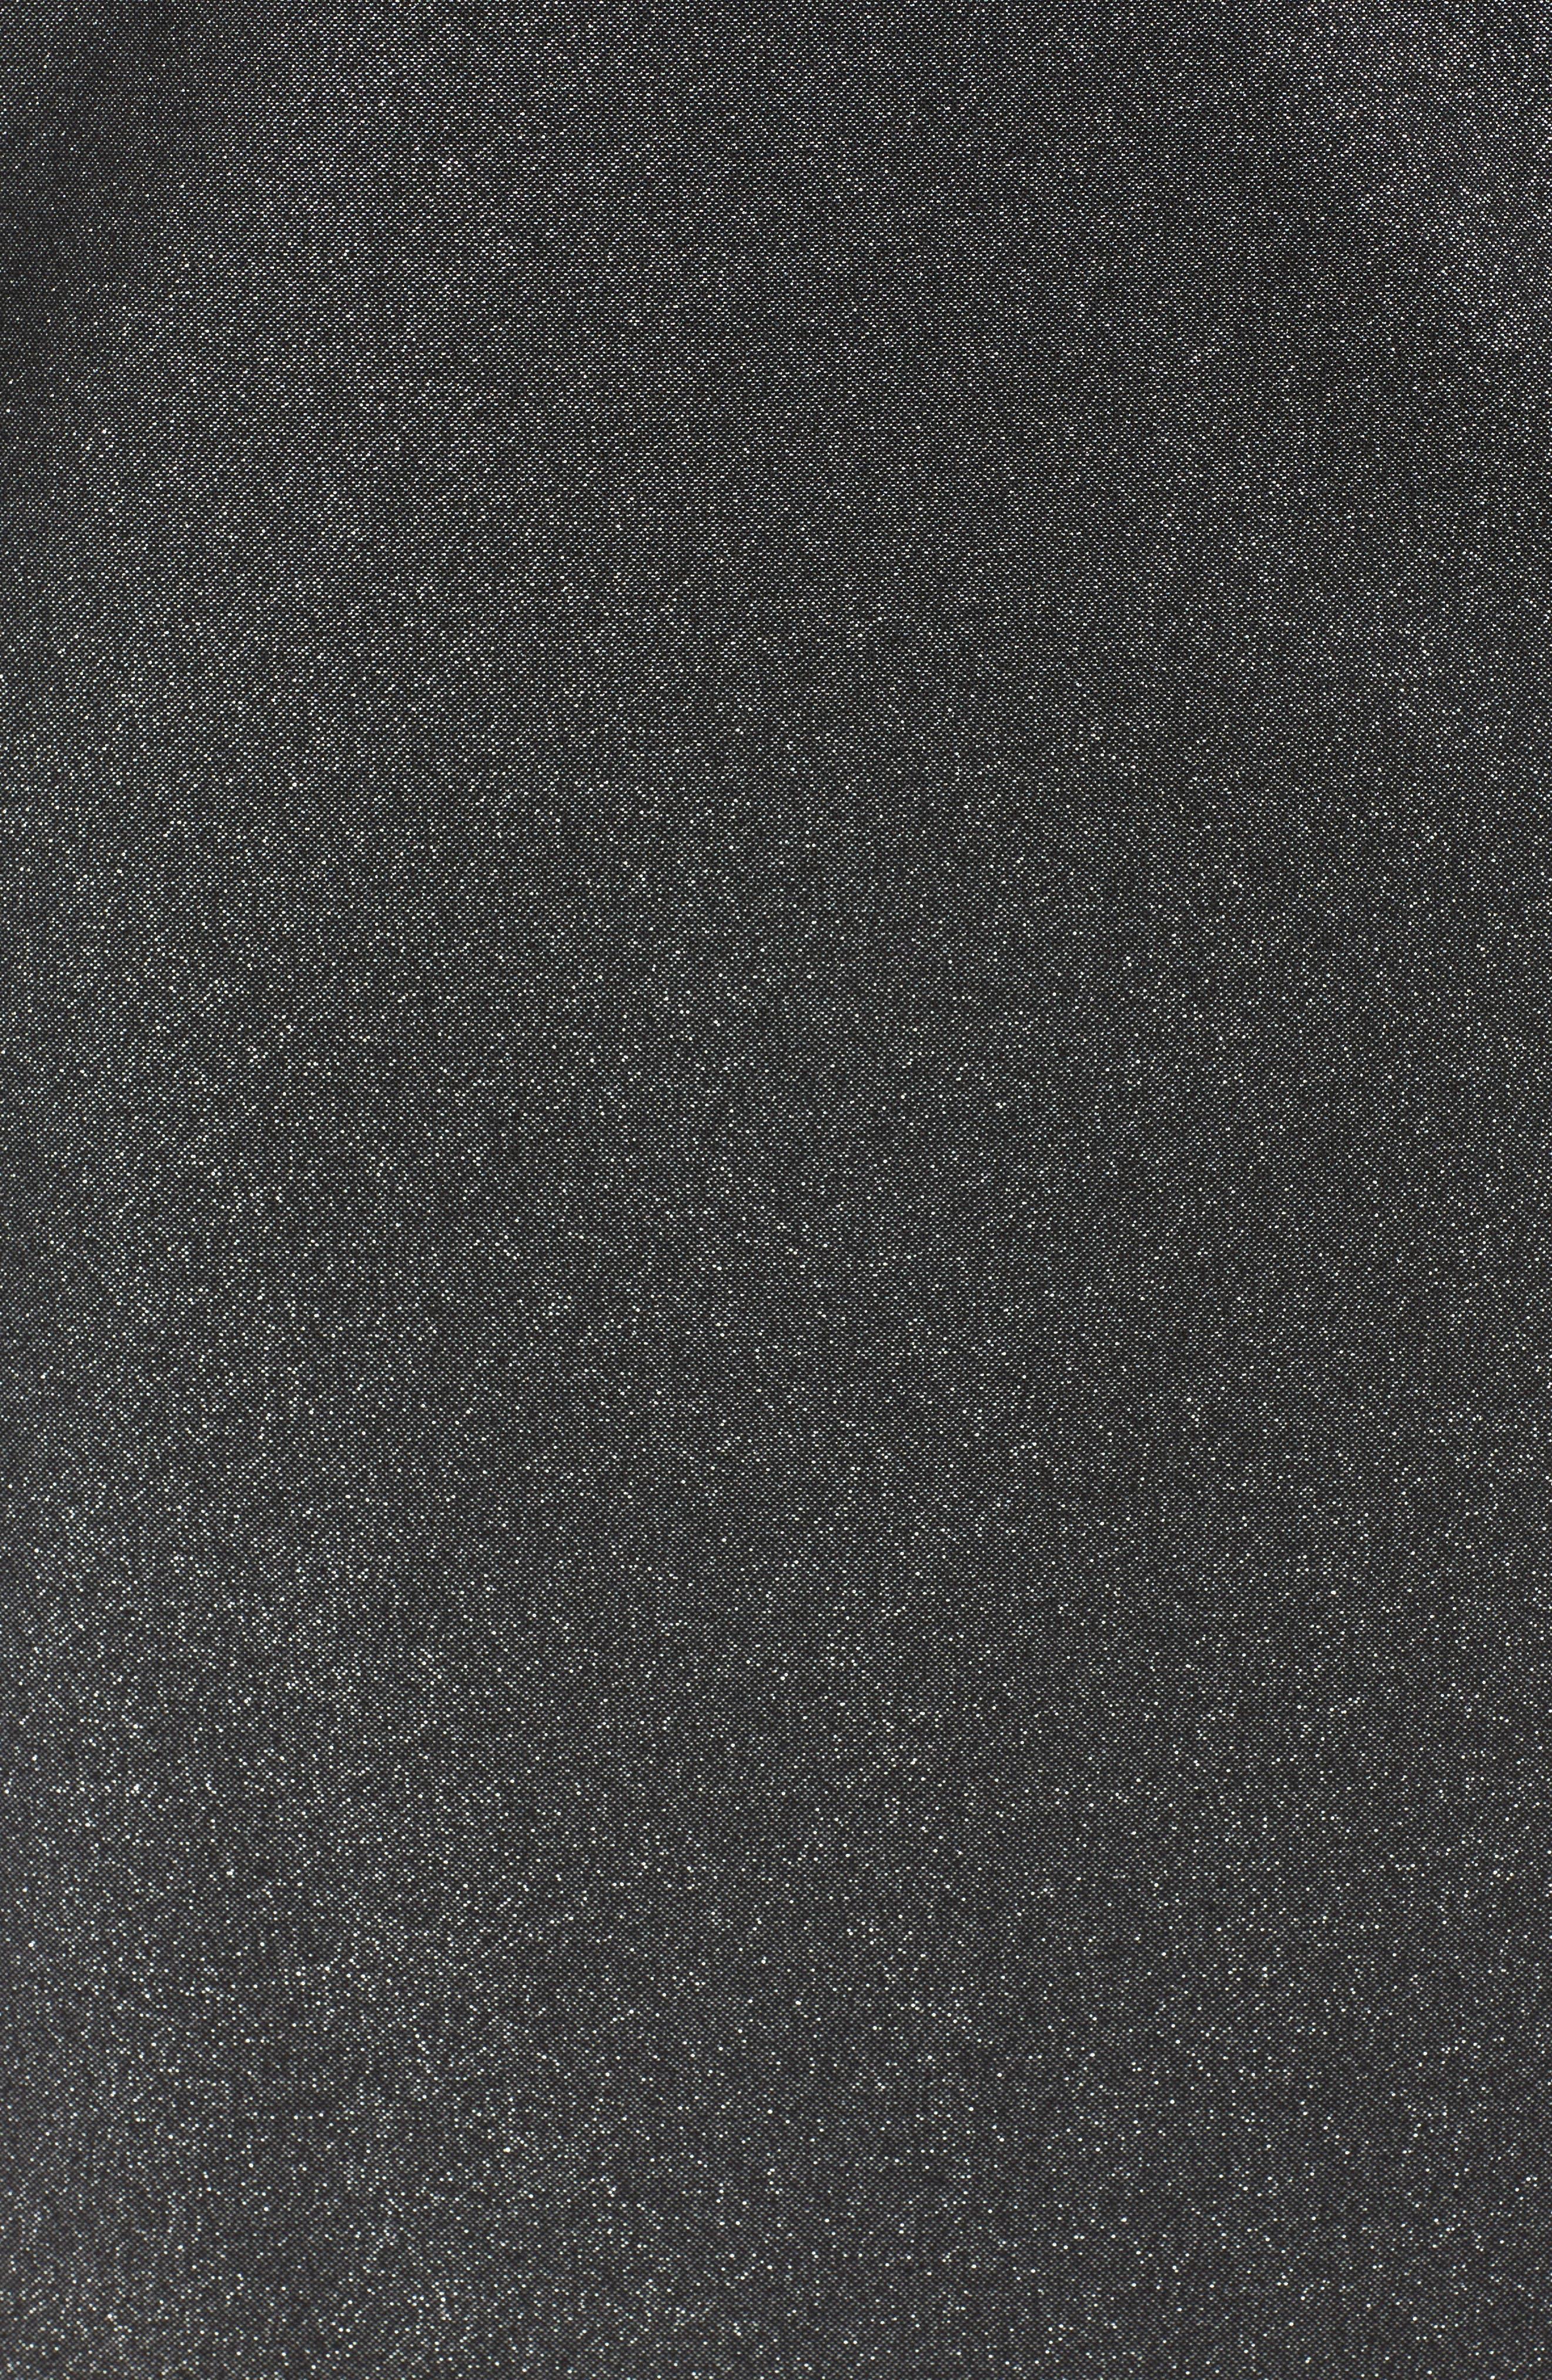 Off the Shoulder Metallic Sheath Dress,                             Alternate thumbnail 5, color,                             006